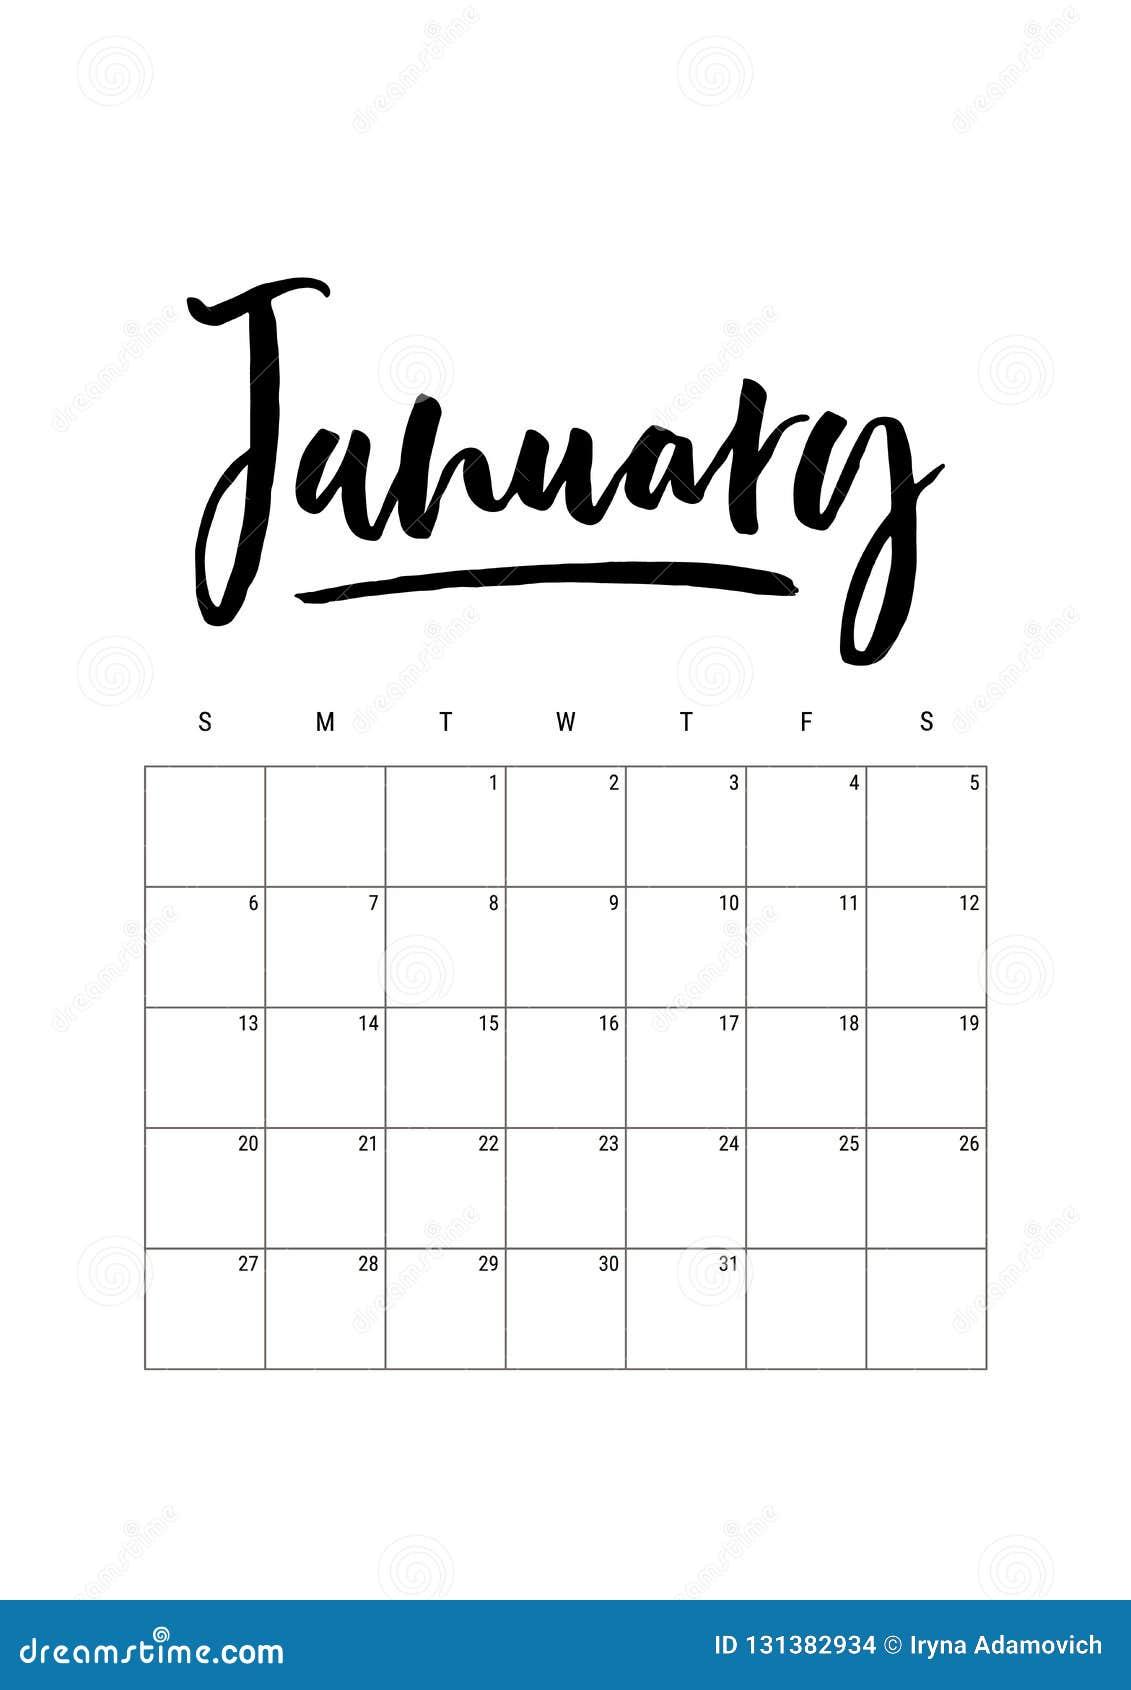 January Calendar Planner 2019 Week Starts On Sunday Part Of Sets